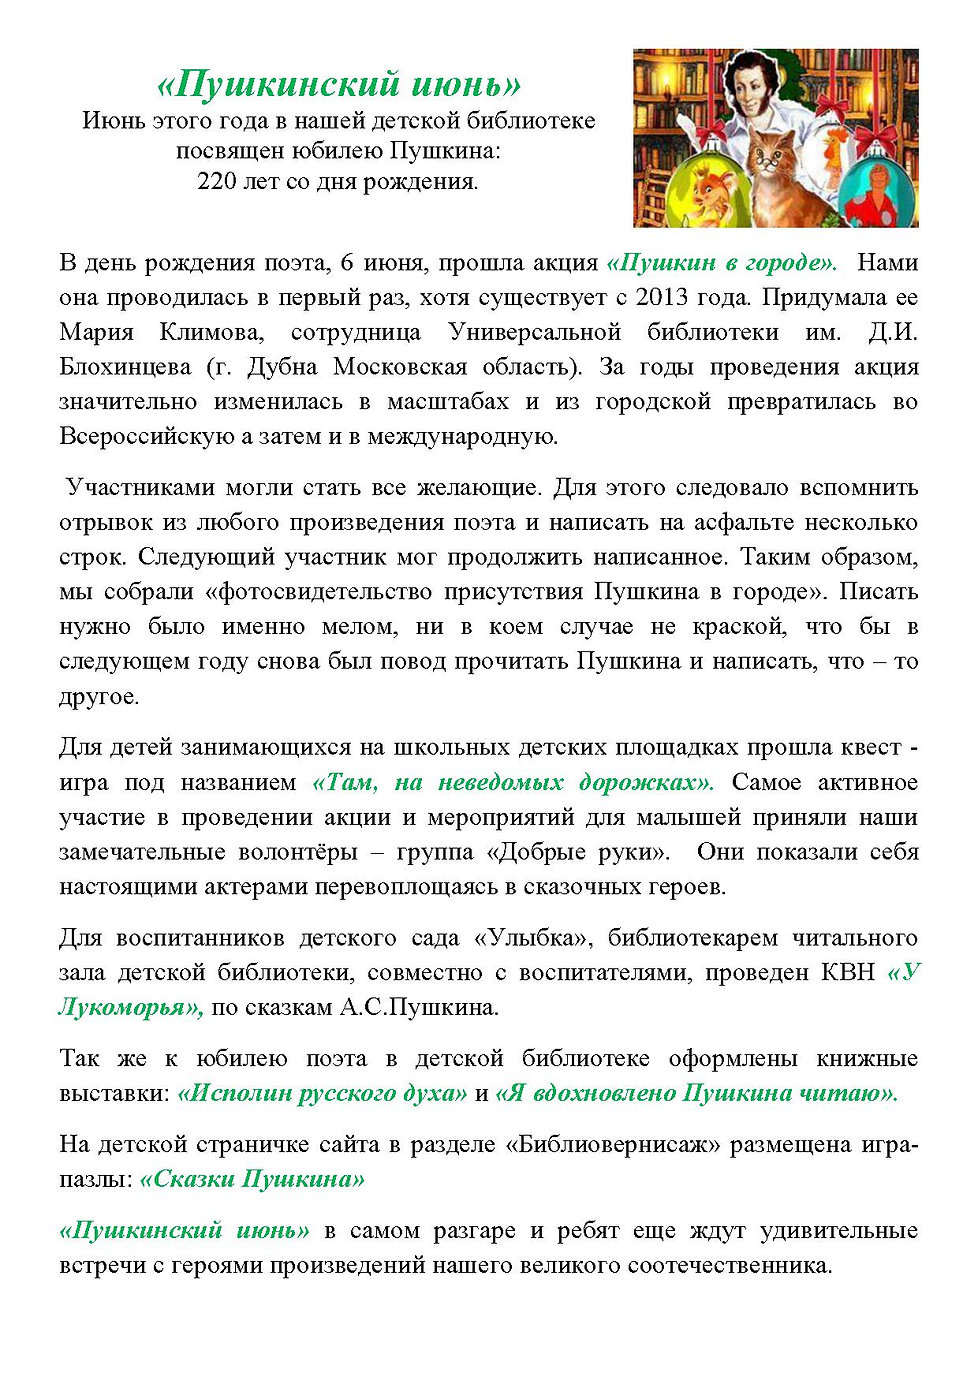 Пушкинский июнь.jpg